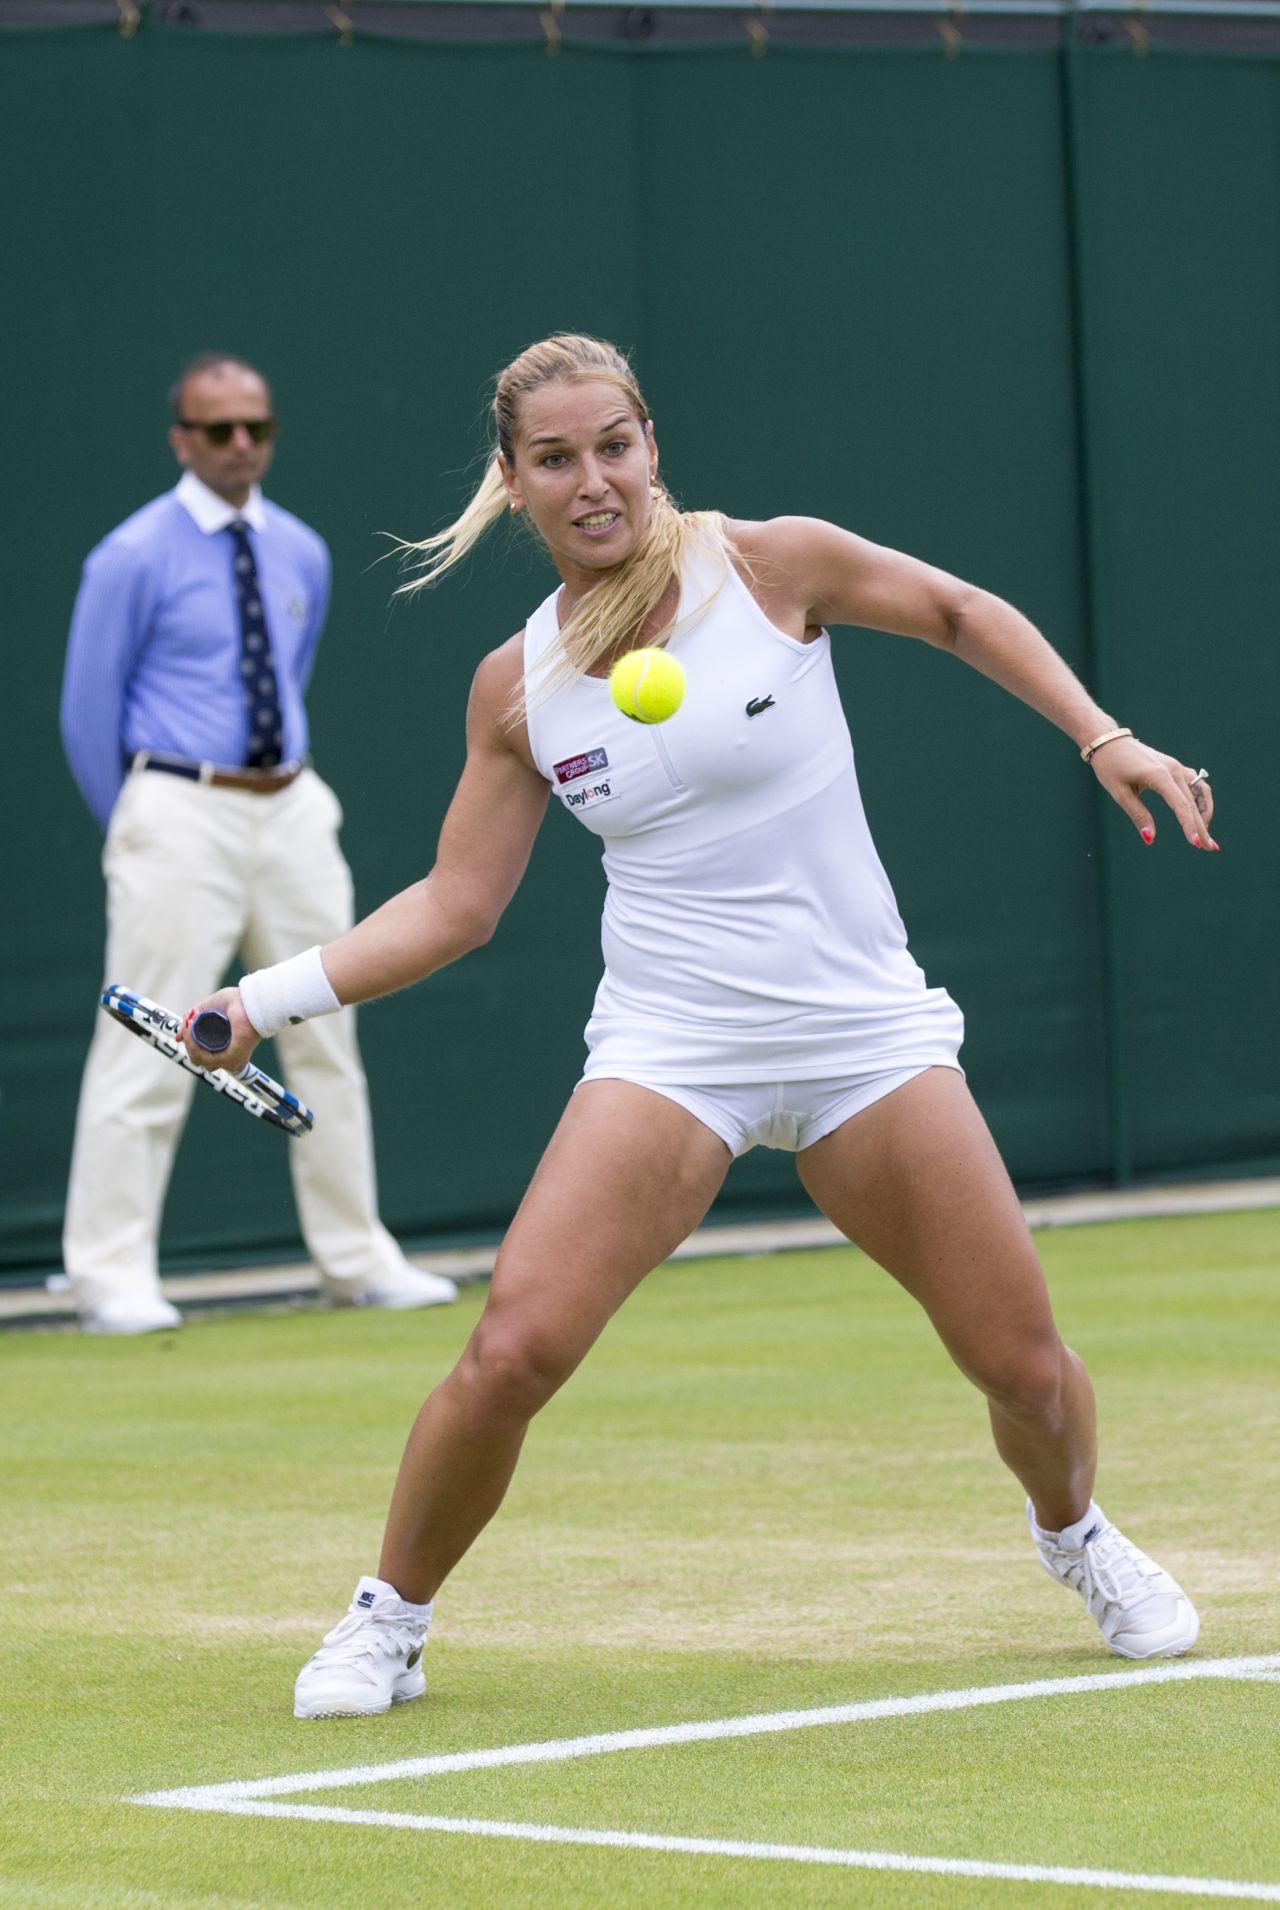 Dominika Cibulkova Wimbledon Tennis Championships In